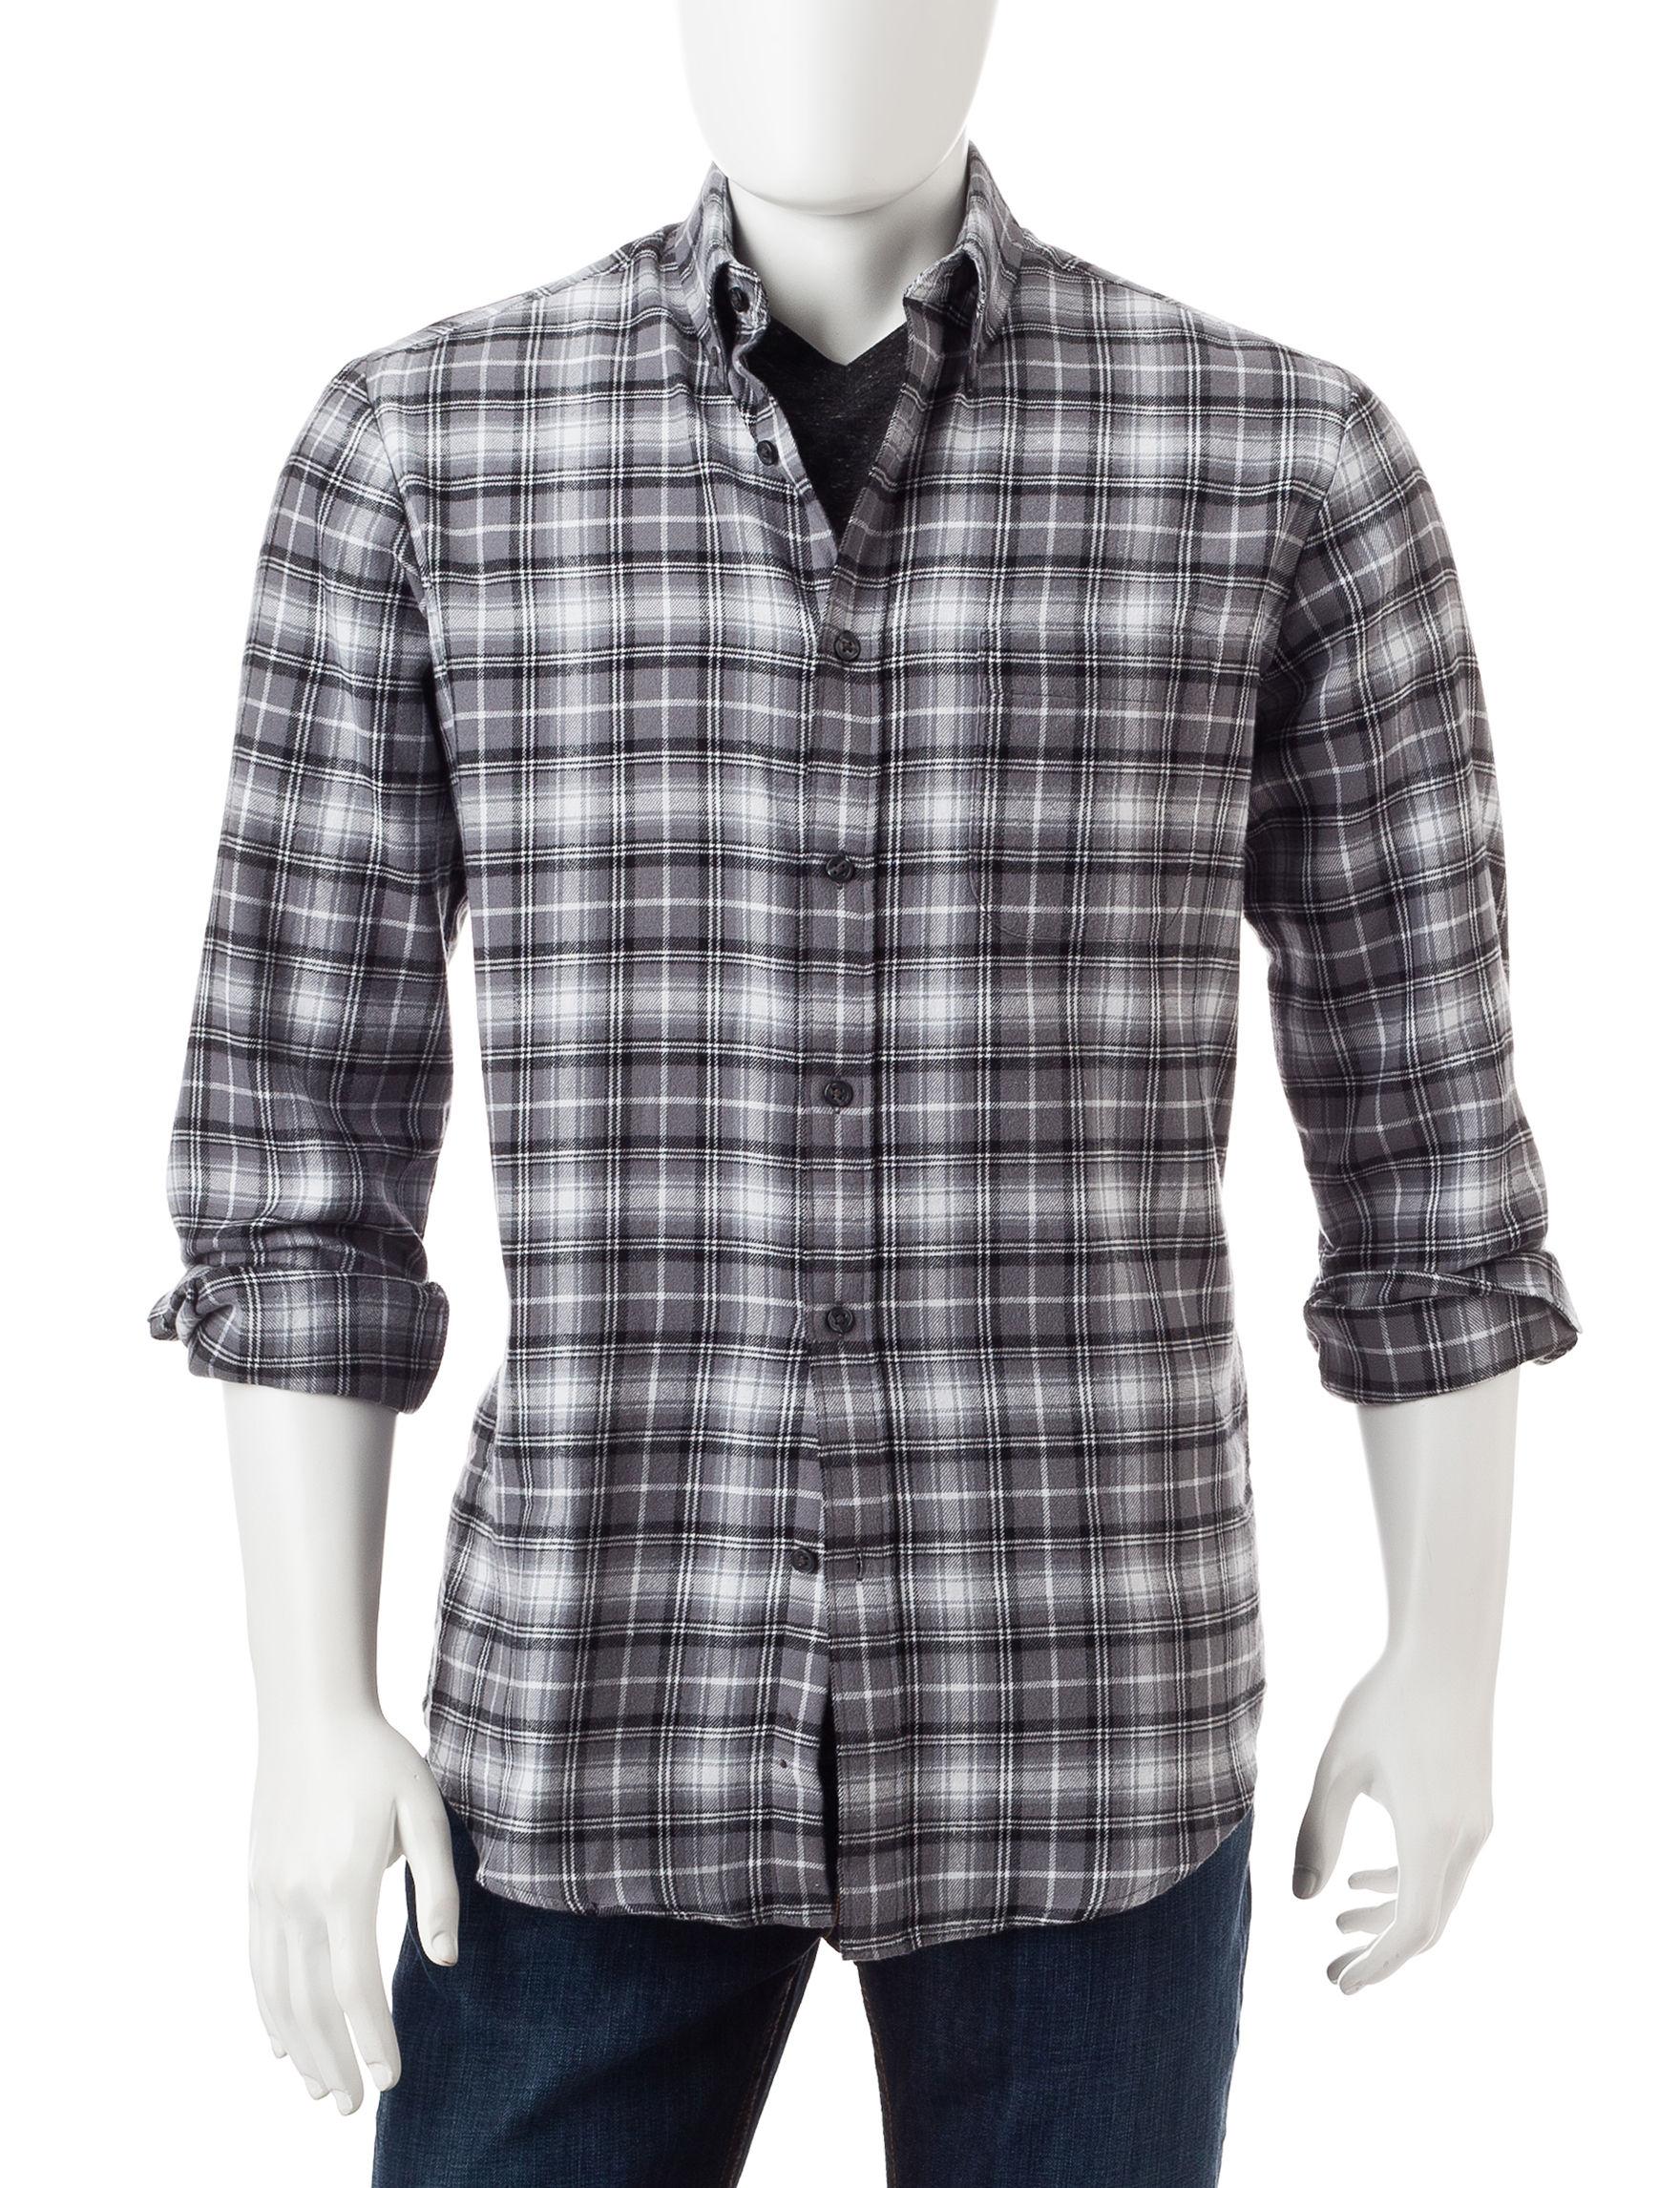 Sun River Black White Plaid Print Flannel Shirt Stage